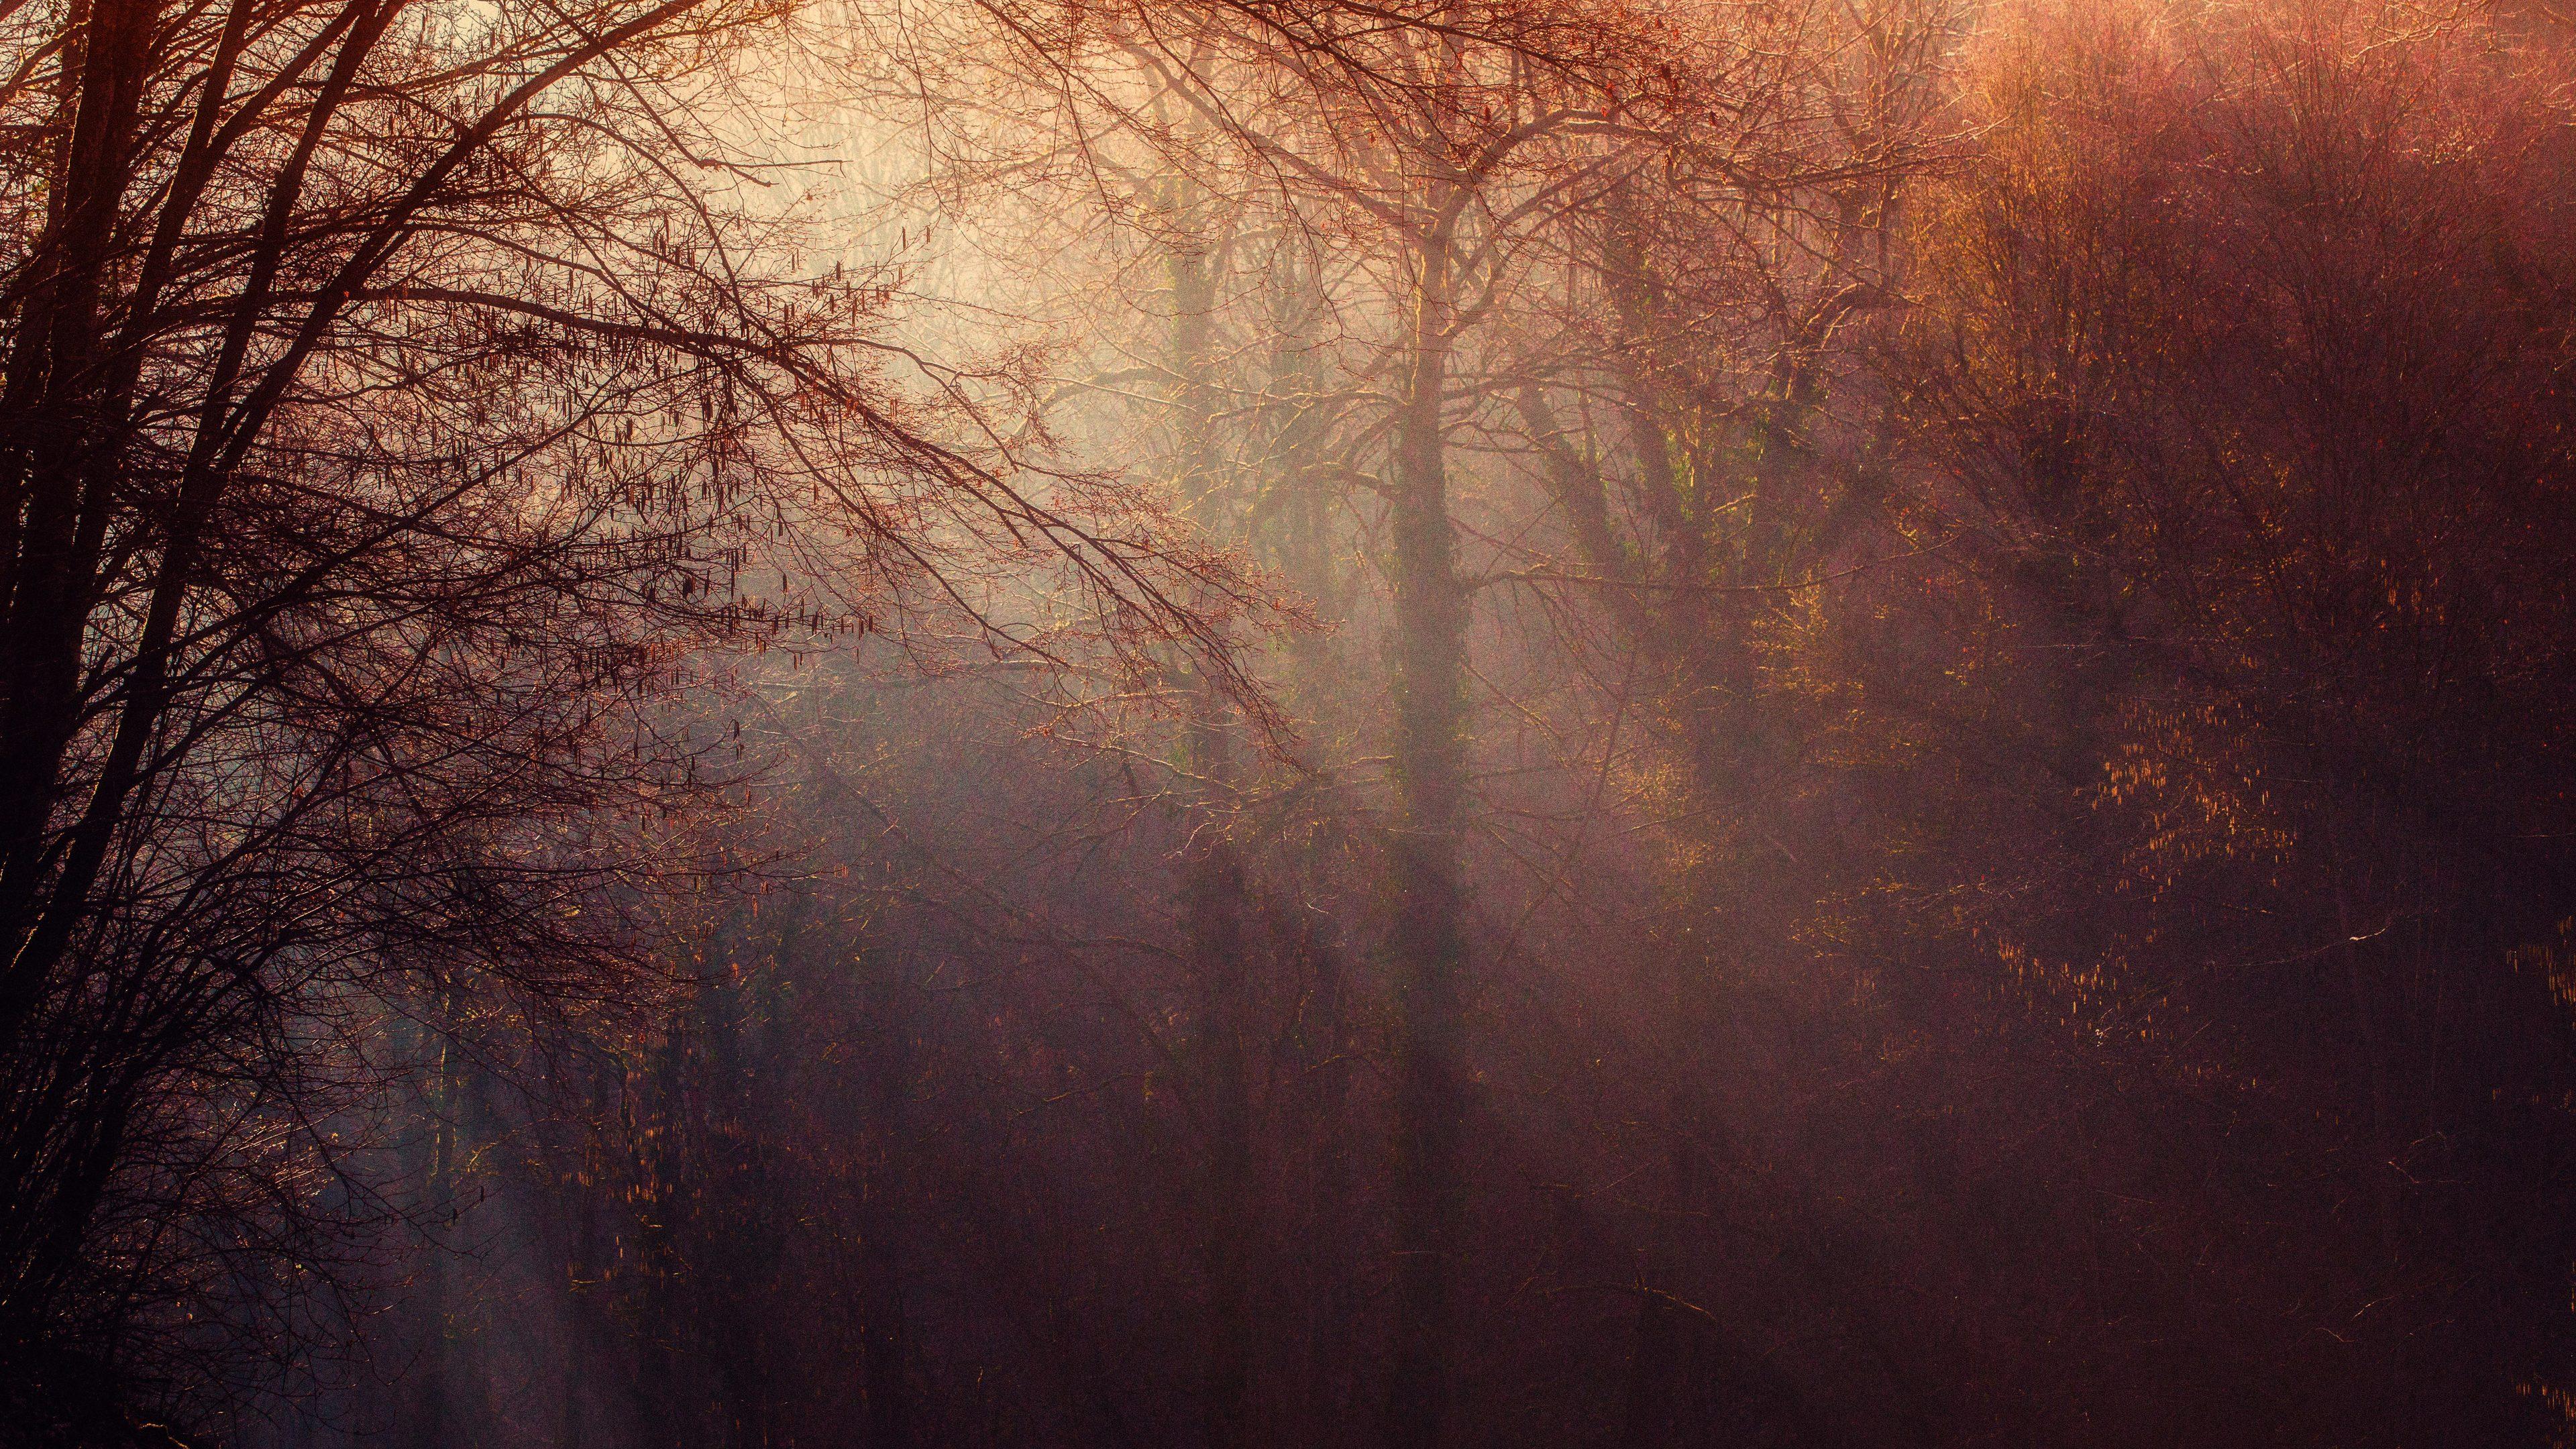 autumn forest sunbeams 4k 1540134799 - Autumn Forest Sunbeams 4k - sunbeam wallpapers, nature wallpapers, hd-wallpapers, forest wallpapers, autumn wallpapers, 5k wallpapers, 4k-wallpapers